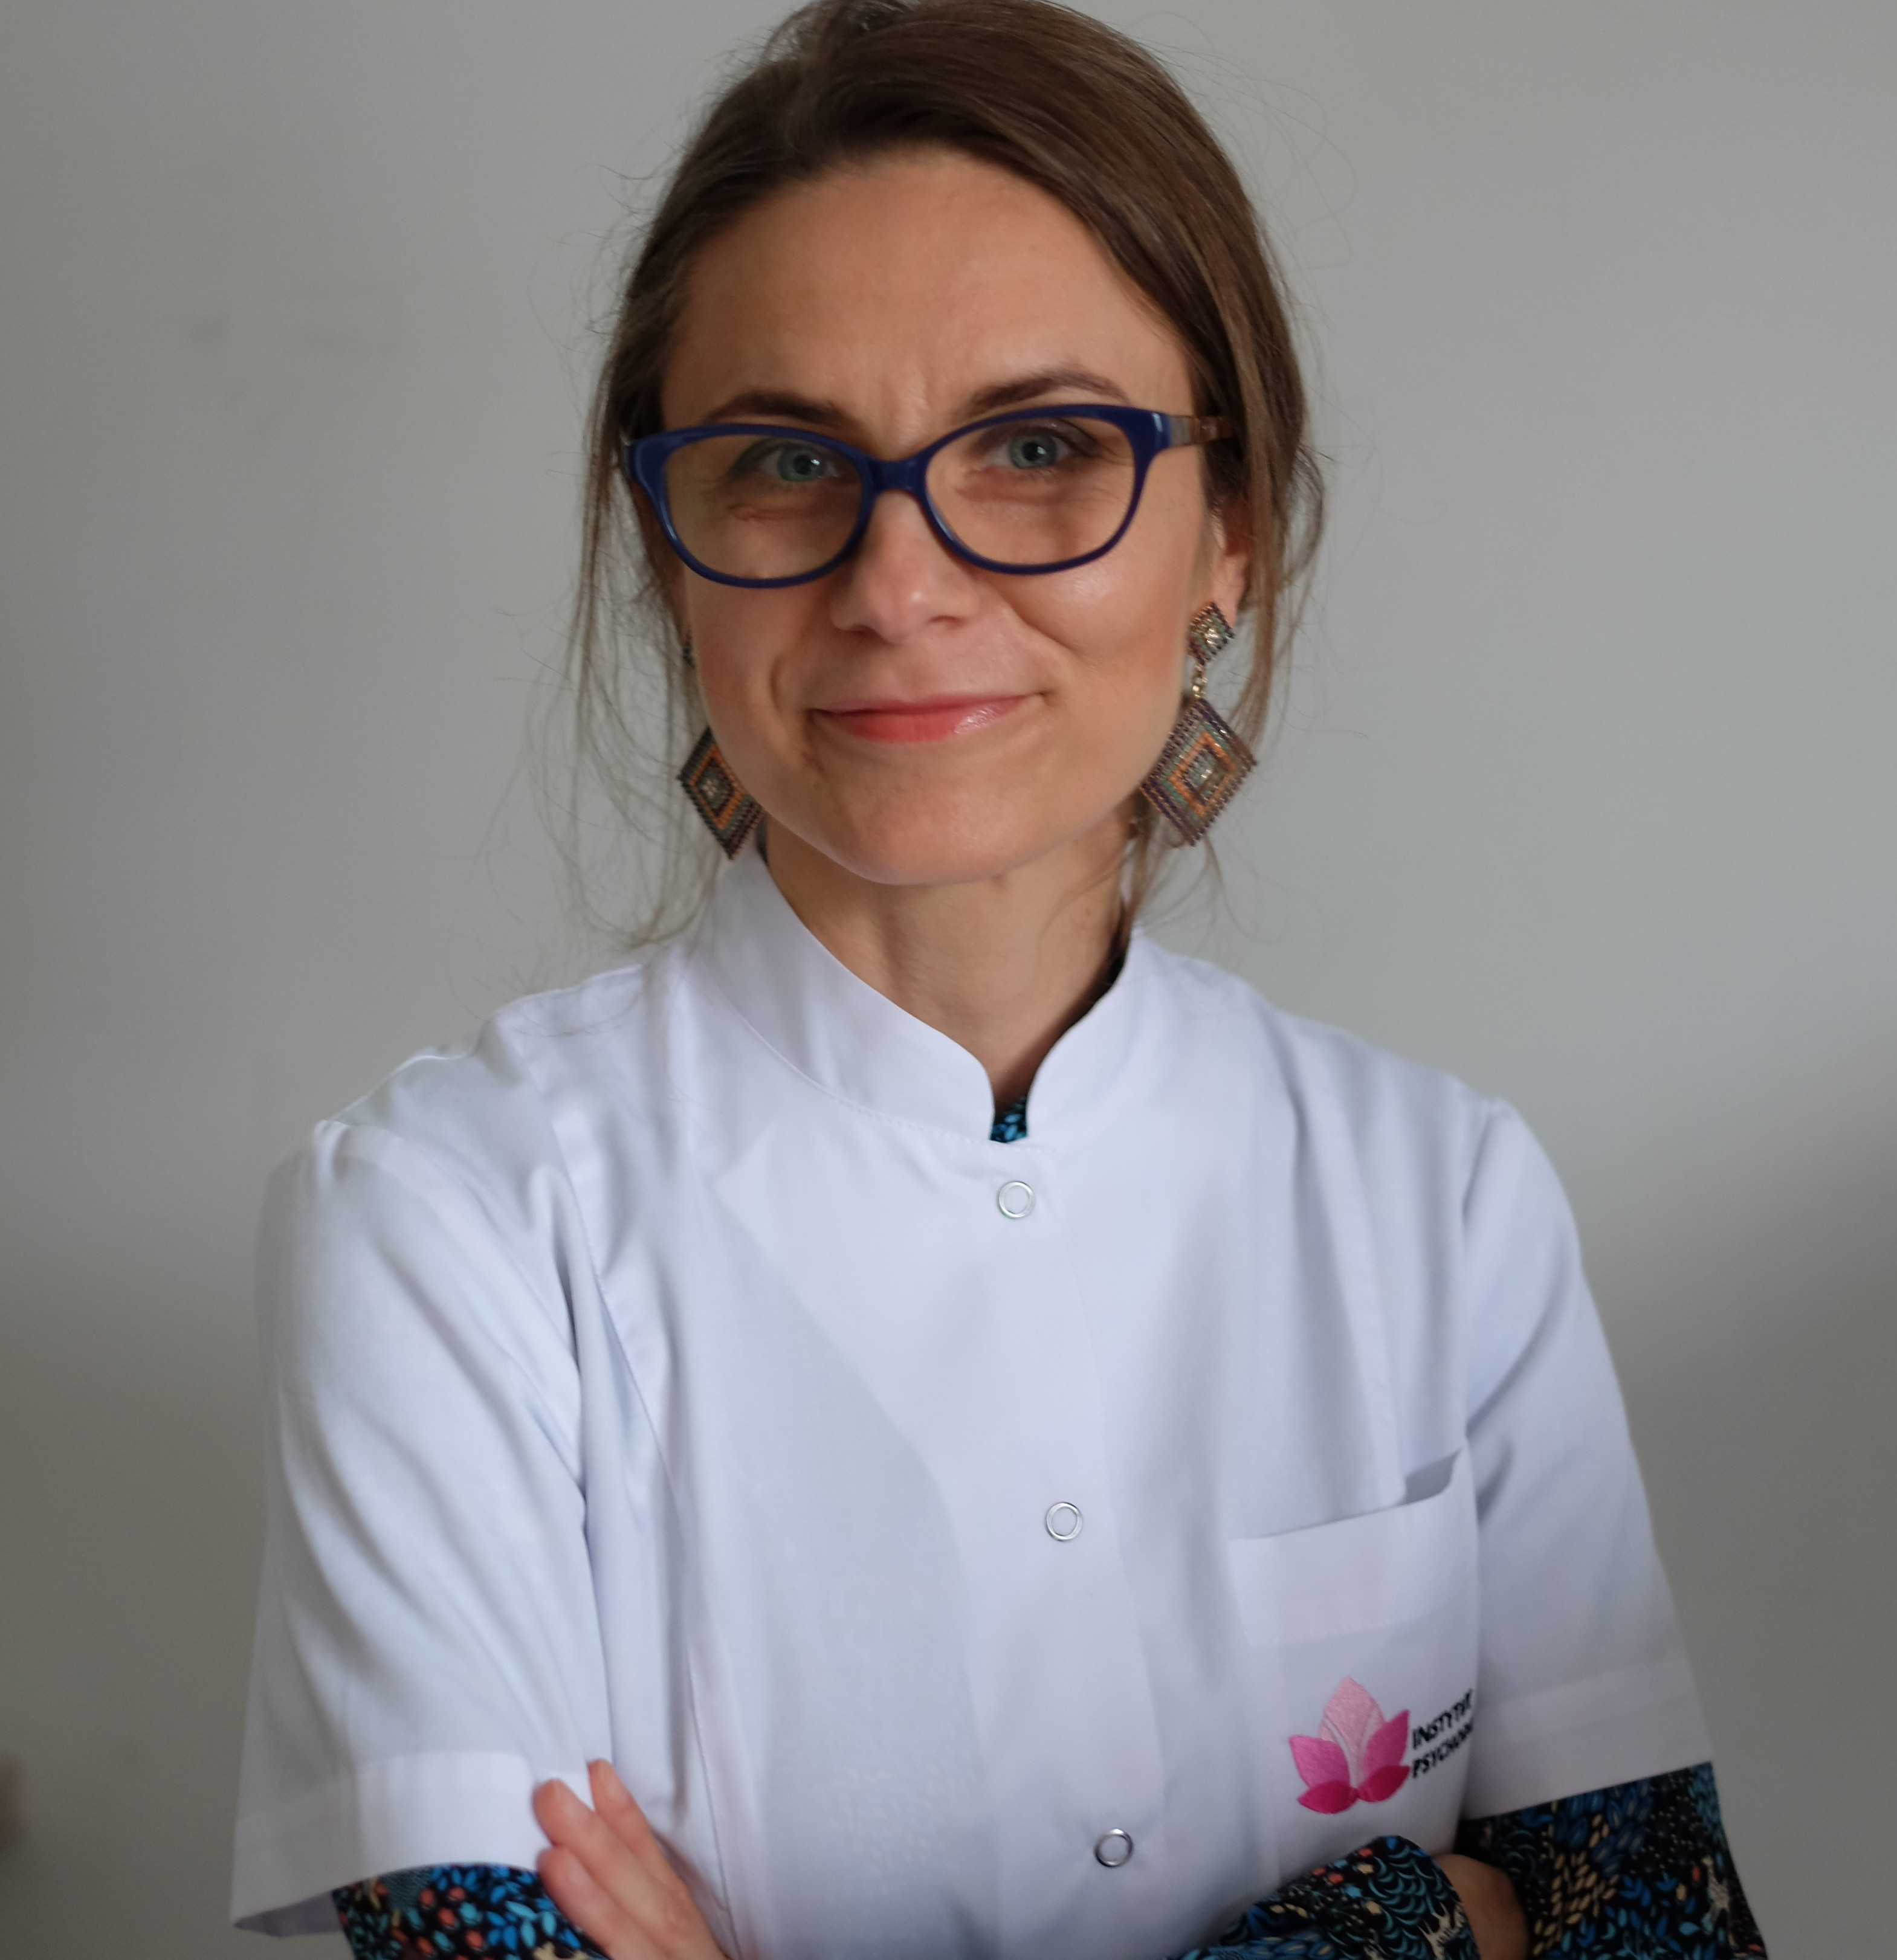 Joanna Rochowicz